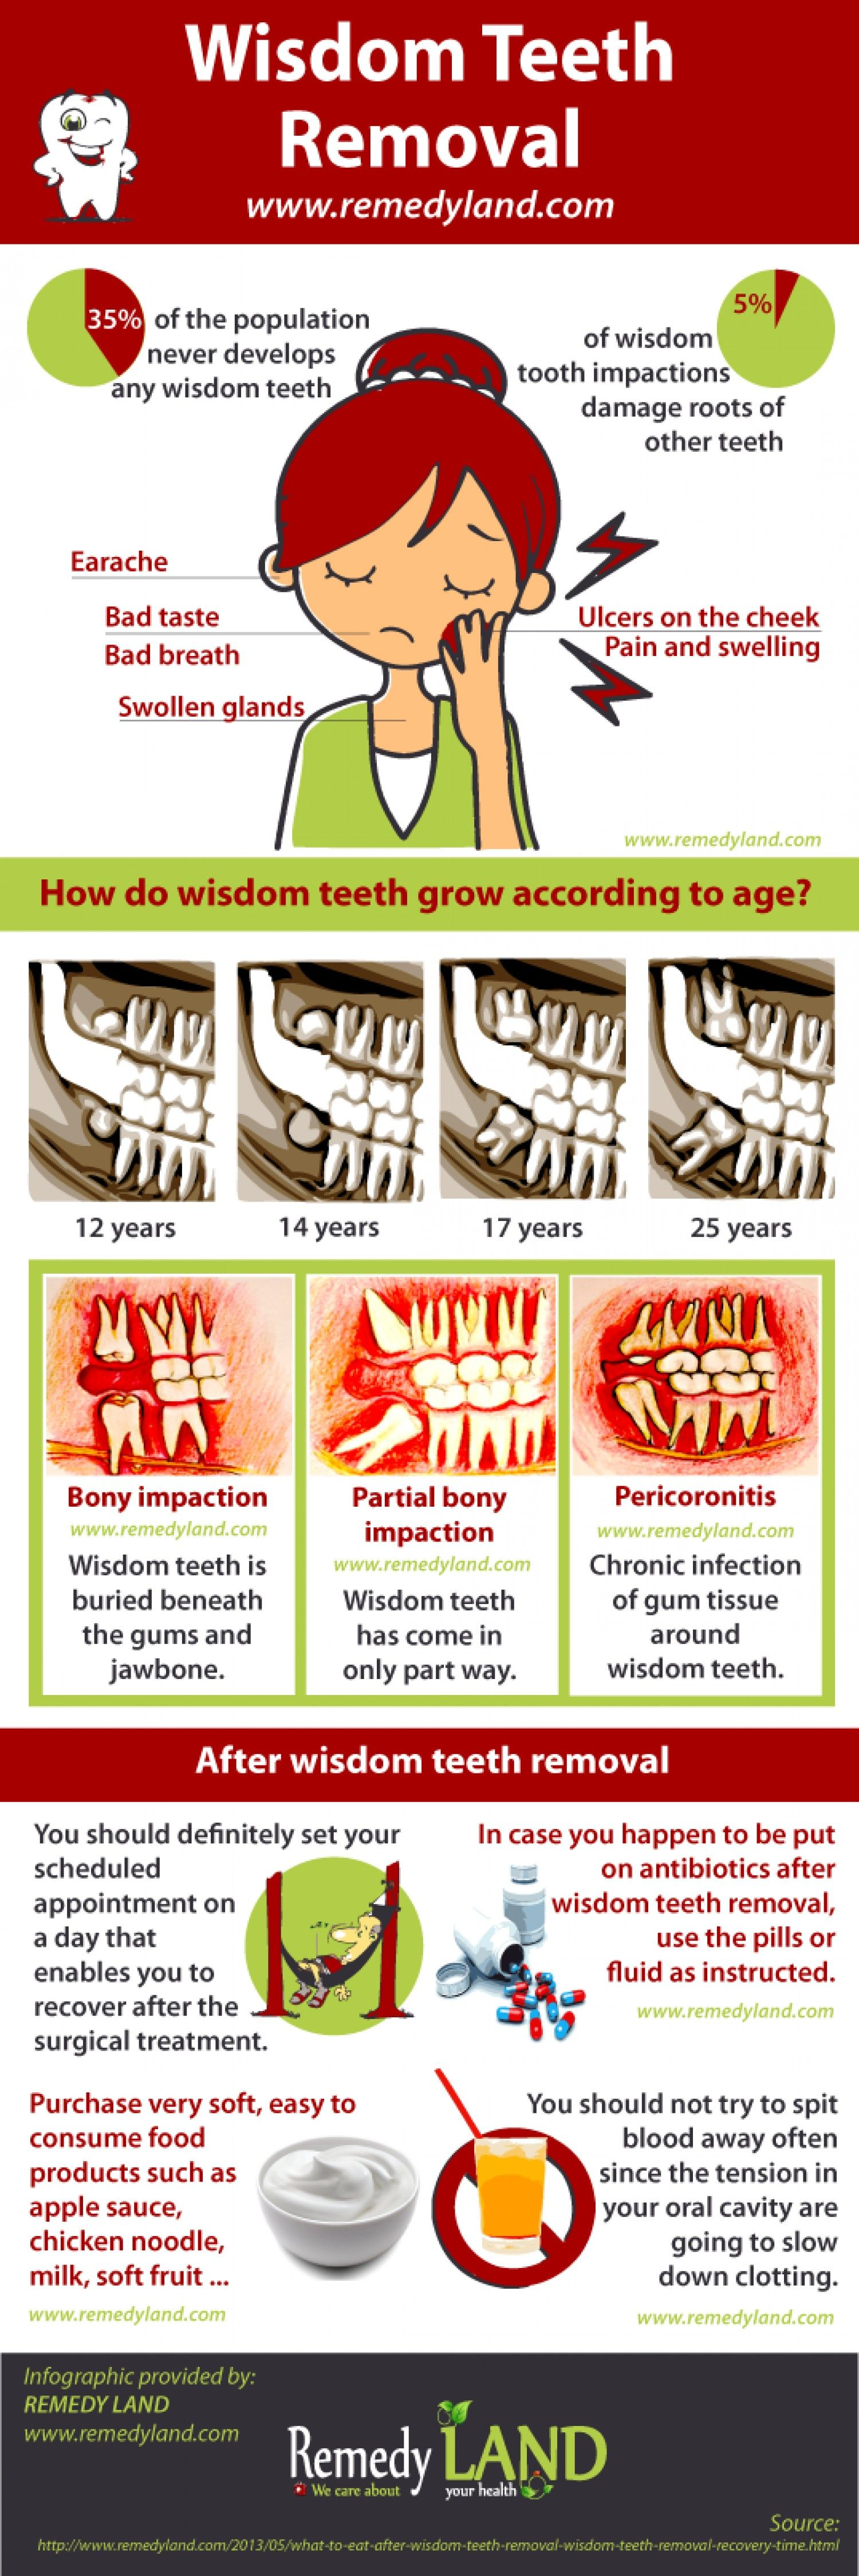 Wisdom teeth removal Infographic Helpful Hints Wisdom